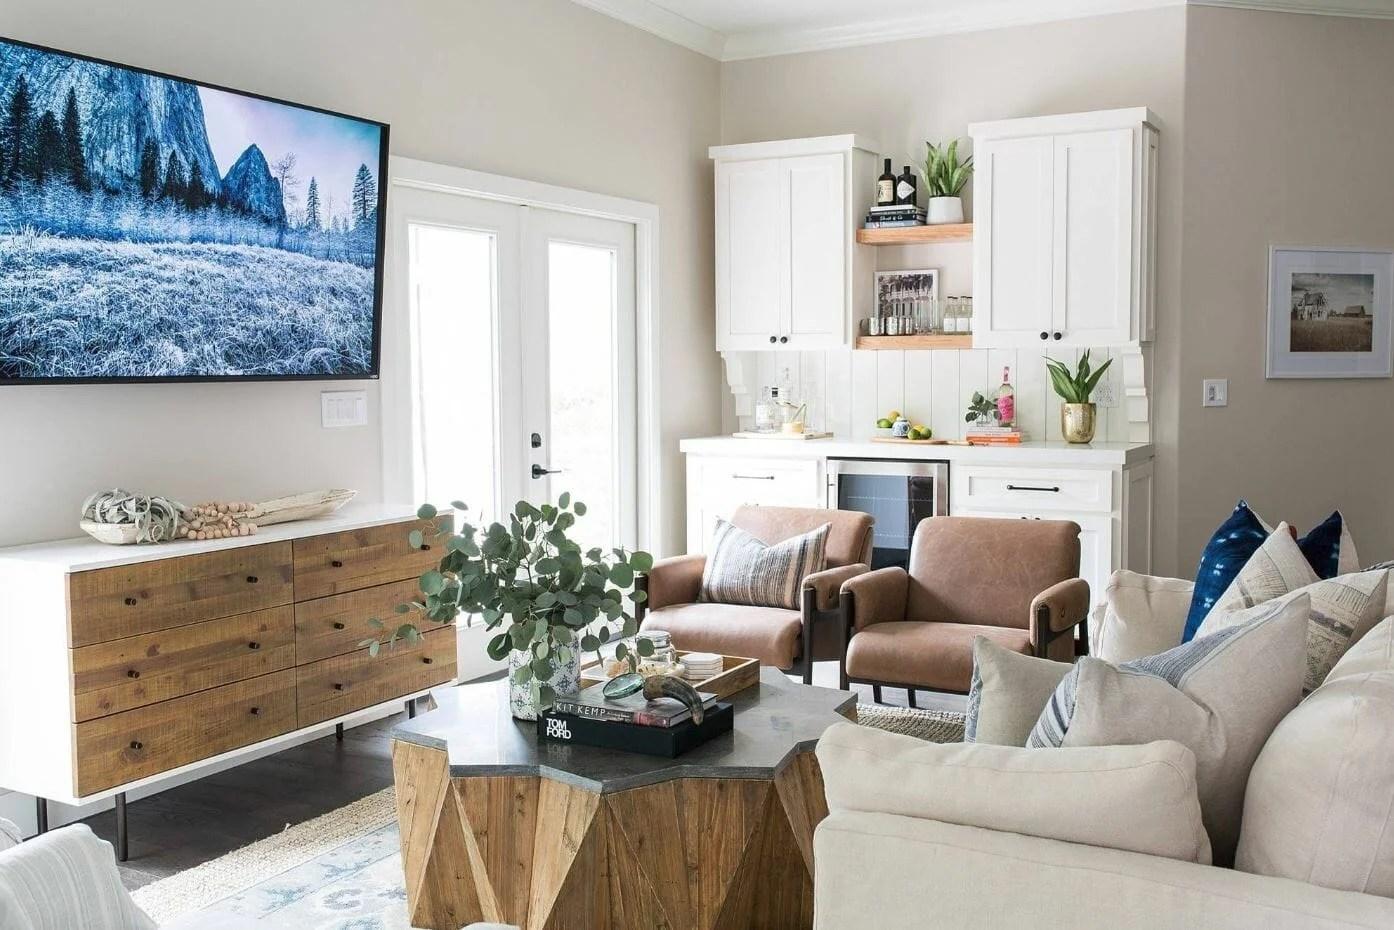 Designer Tips Tricks For Your Home Interior Design